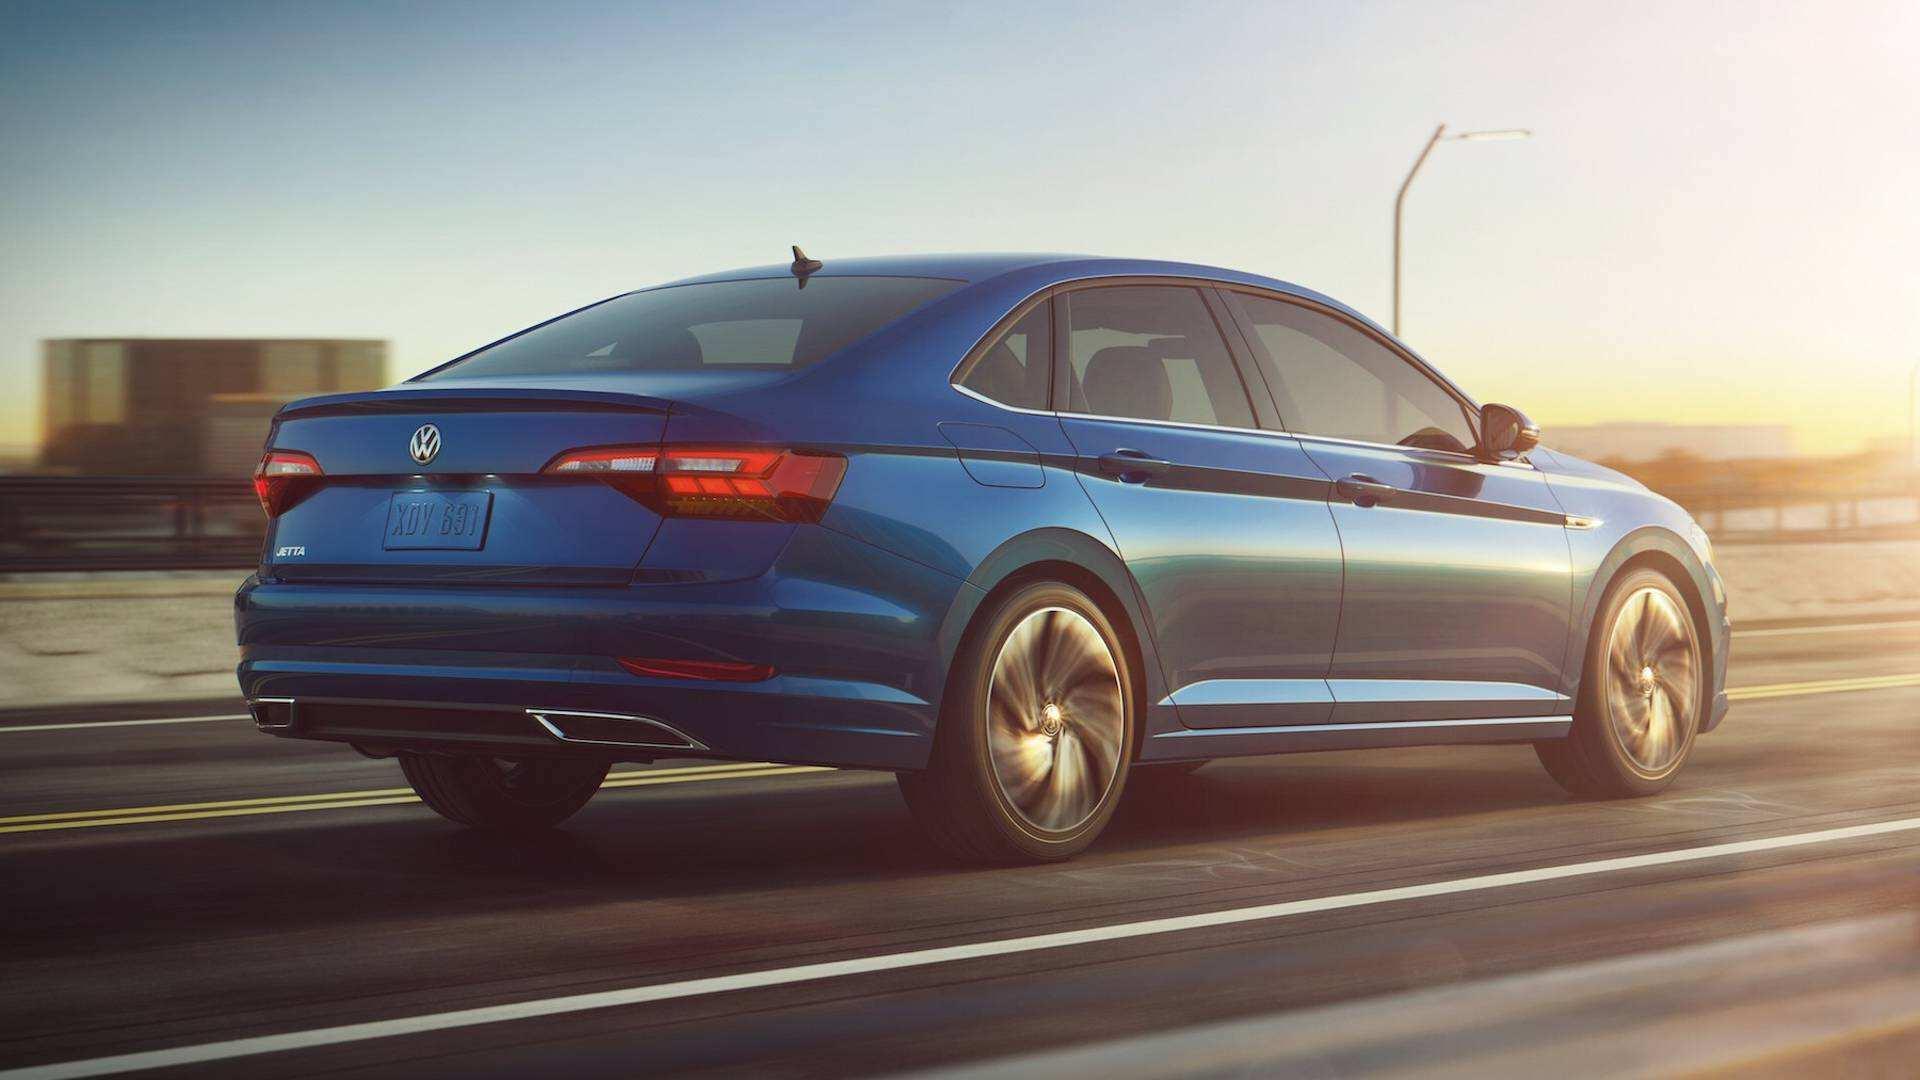 87 Gallery of 2020 Volkswagen Gli Spesification for 2020 Volkswagen Gli